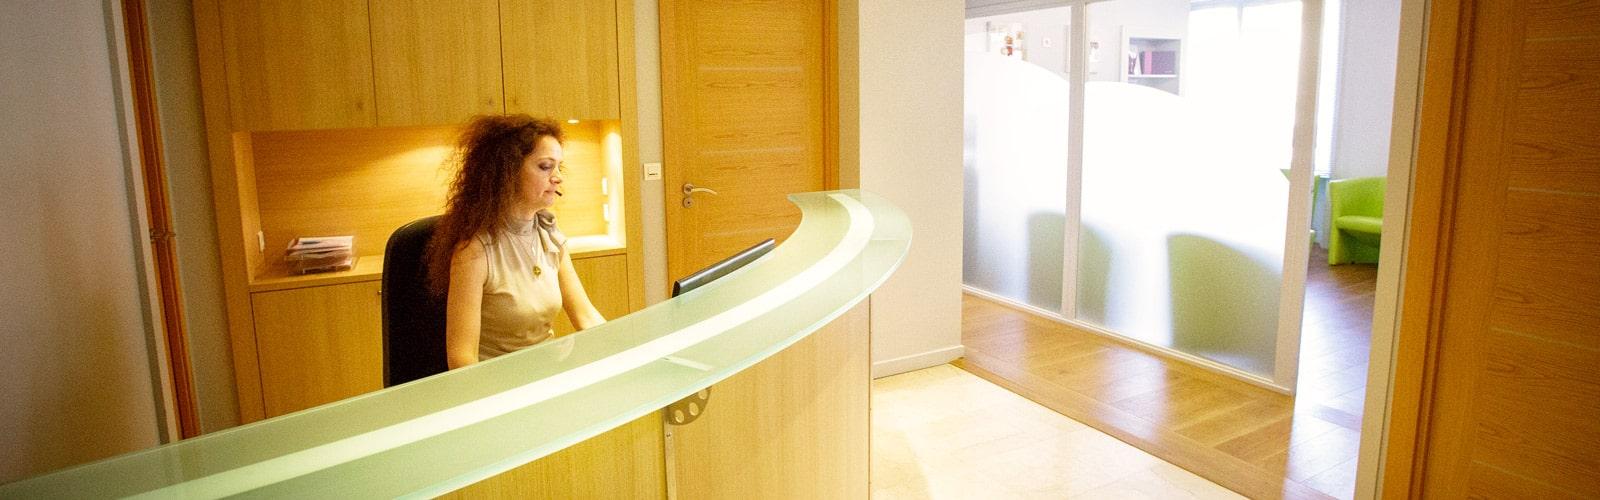 centre de m decine esth tique et anti ge lyon 69 nicolas costa. Black Bedroom Furniture Sets. Home Design Ideas